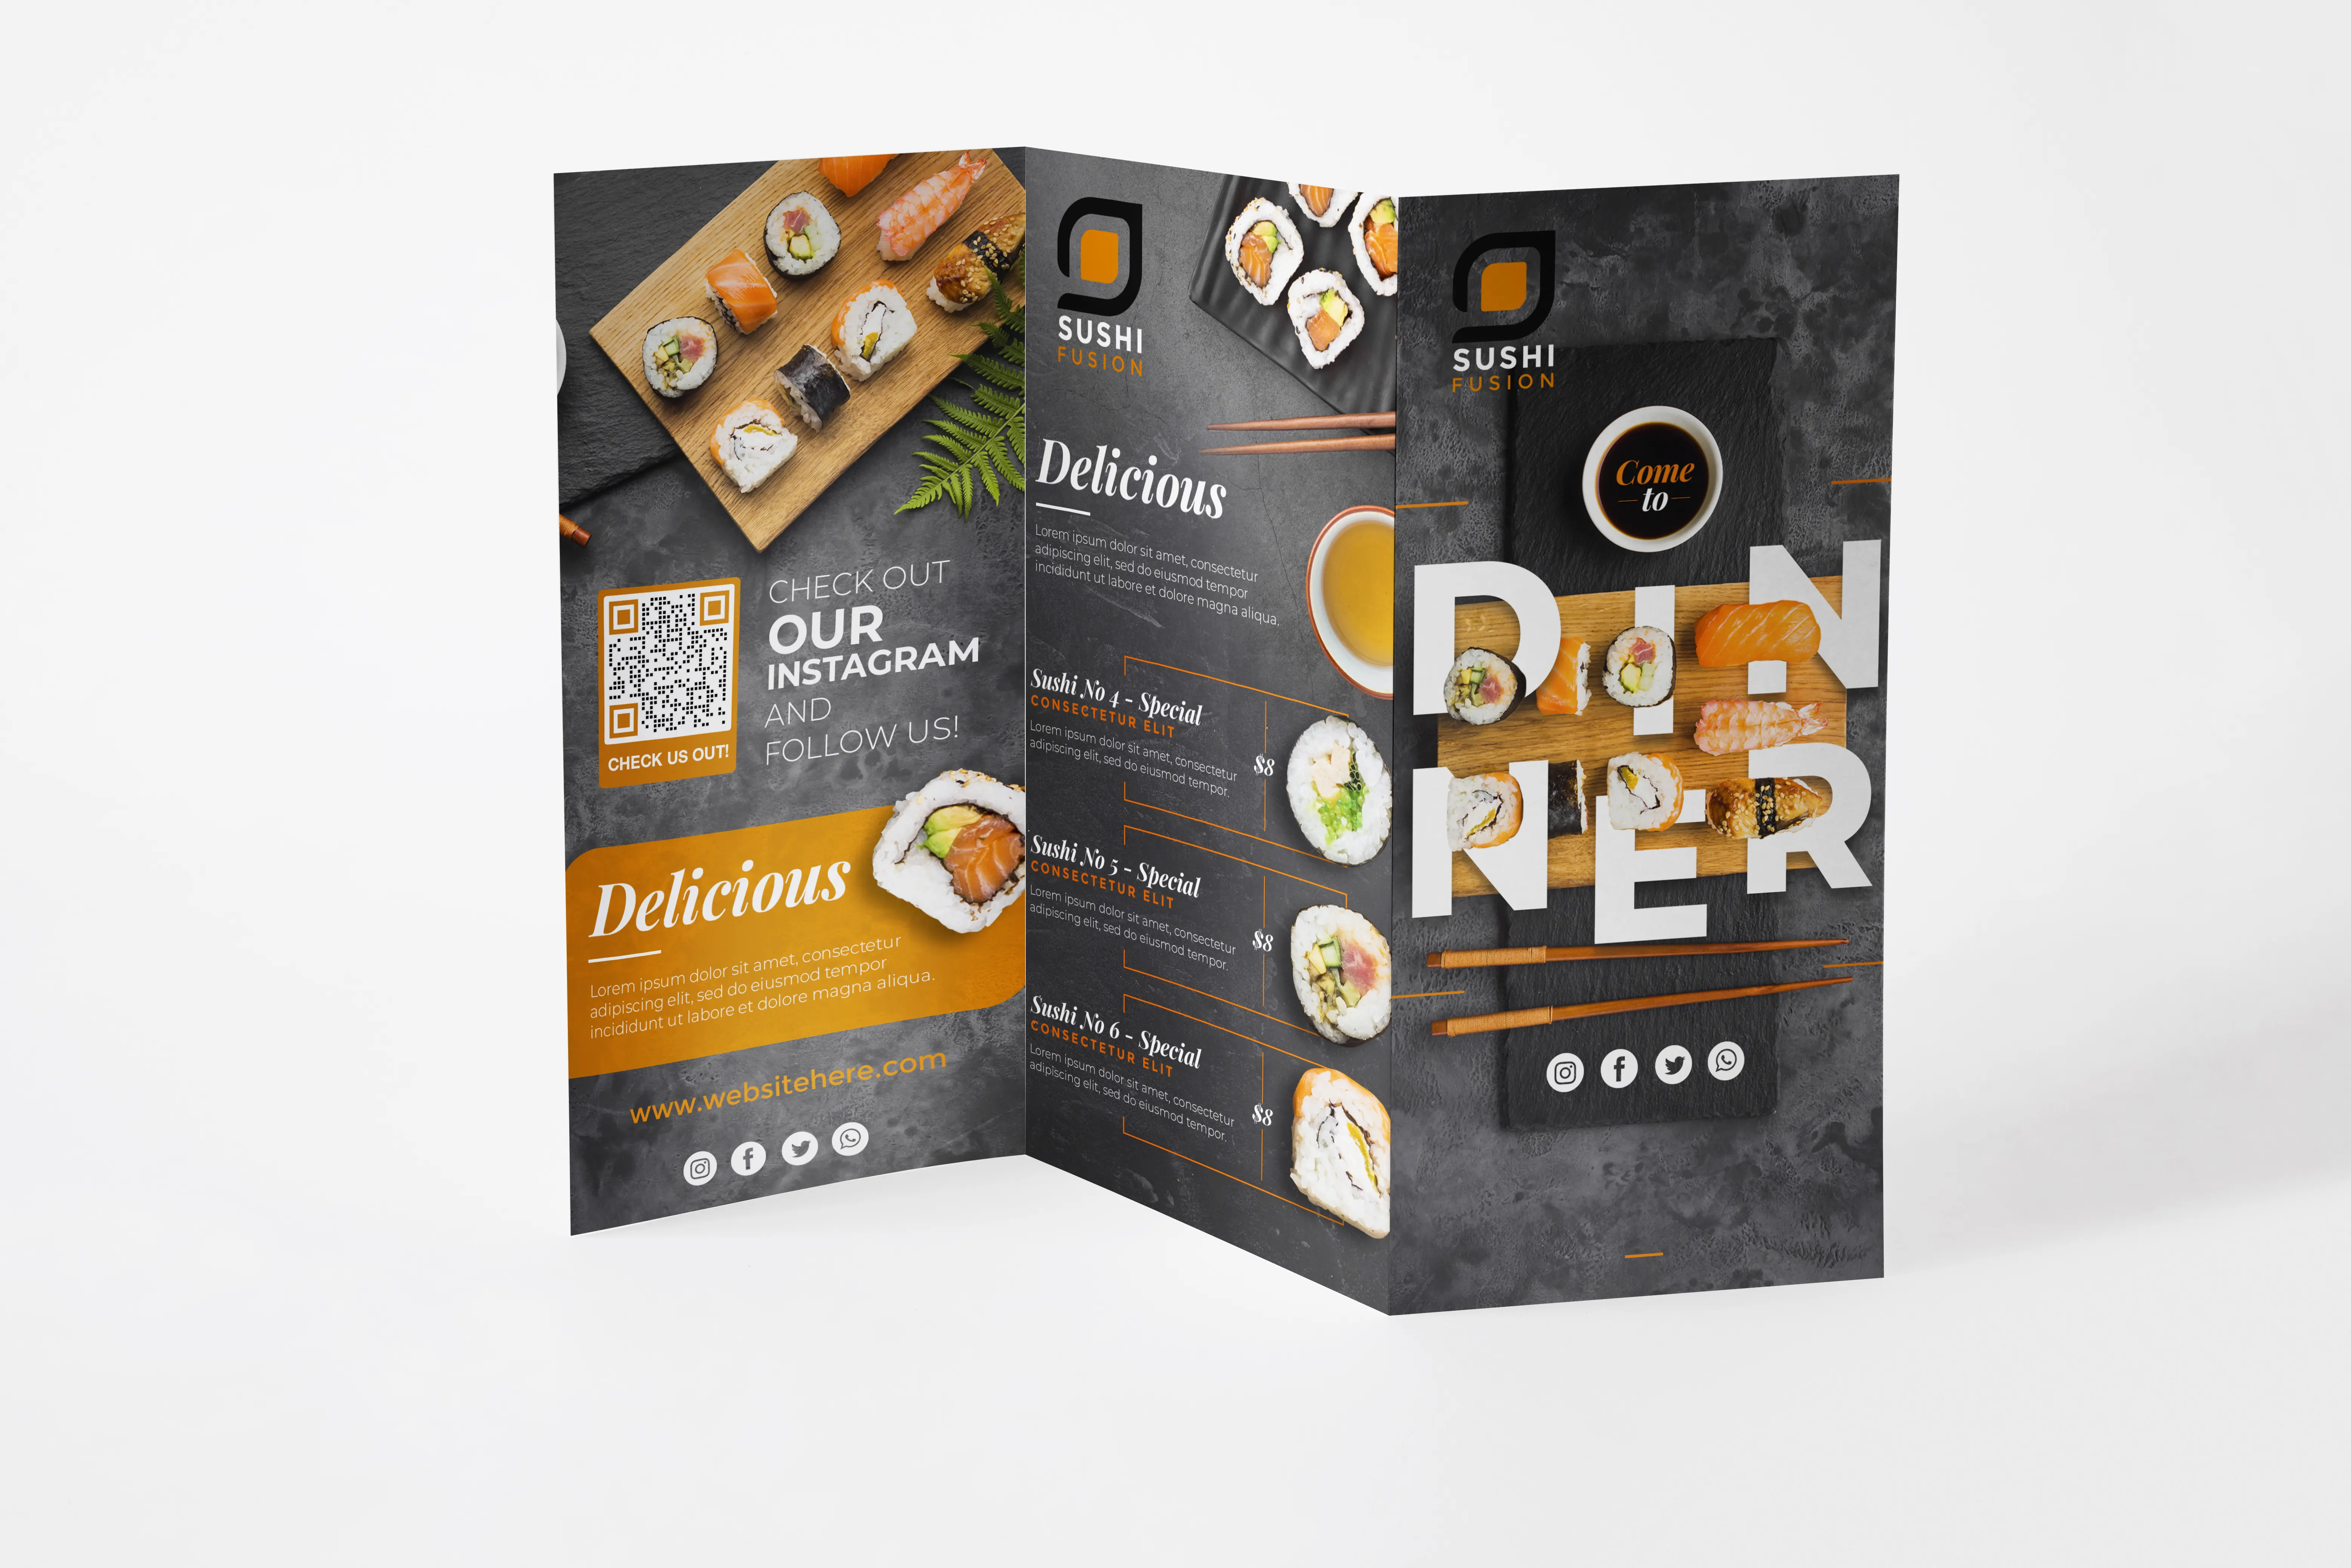 instagram qr code generator for promotion